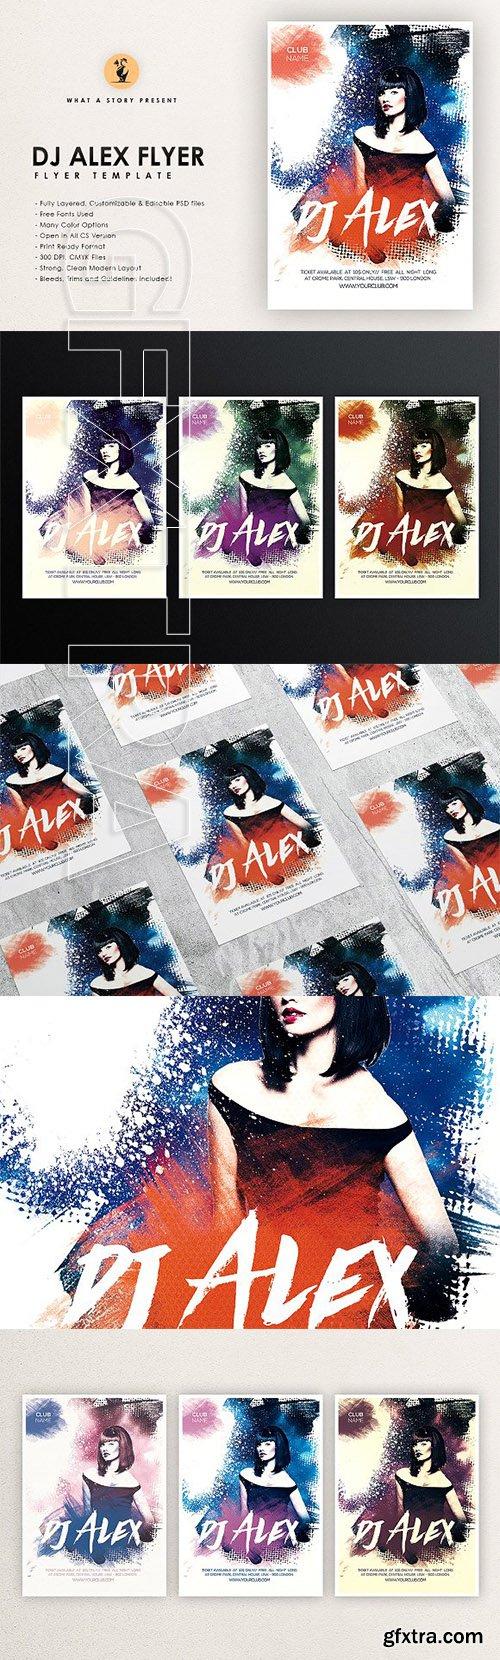 CreativeMarket - Dj Alex 2 Flyer 2708894